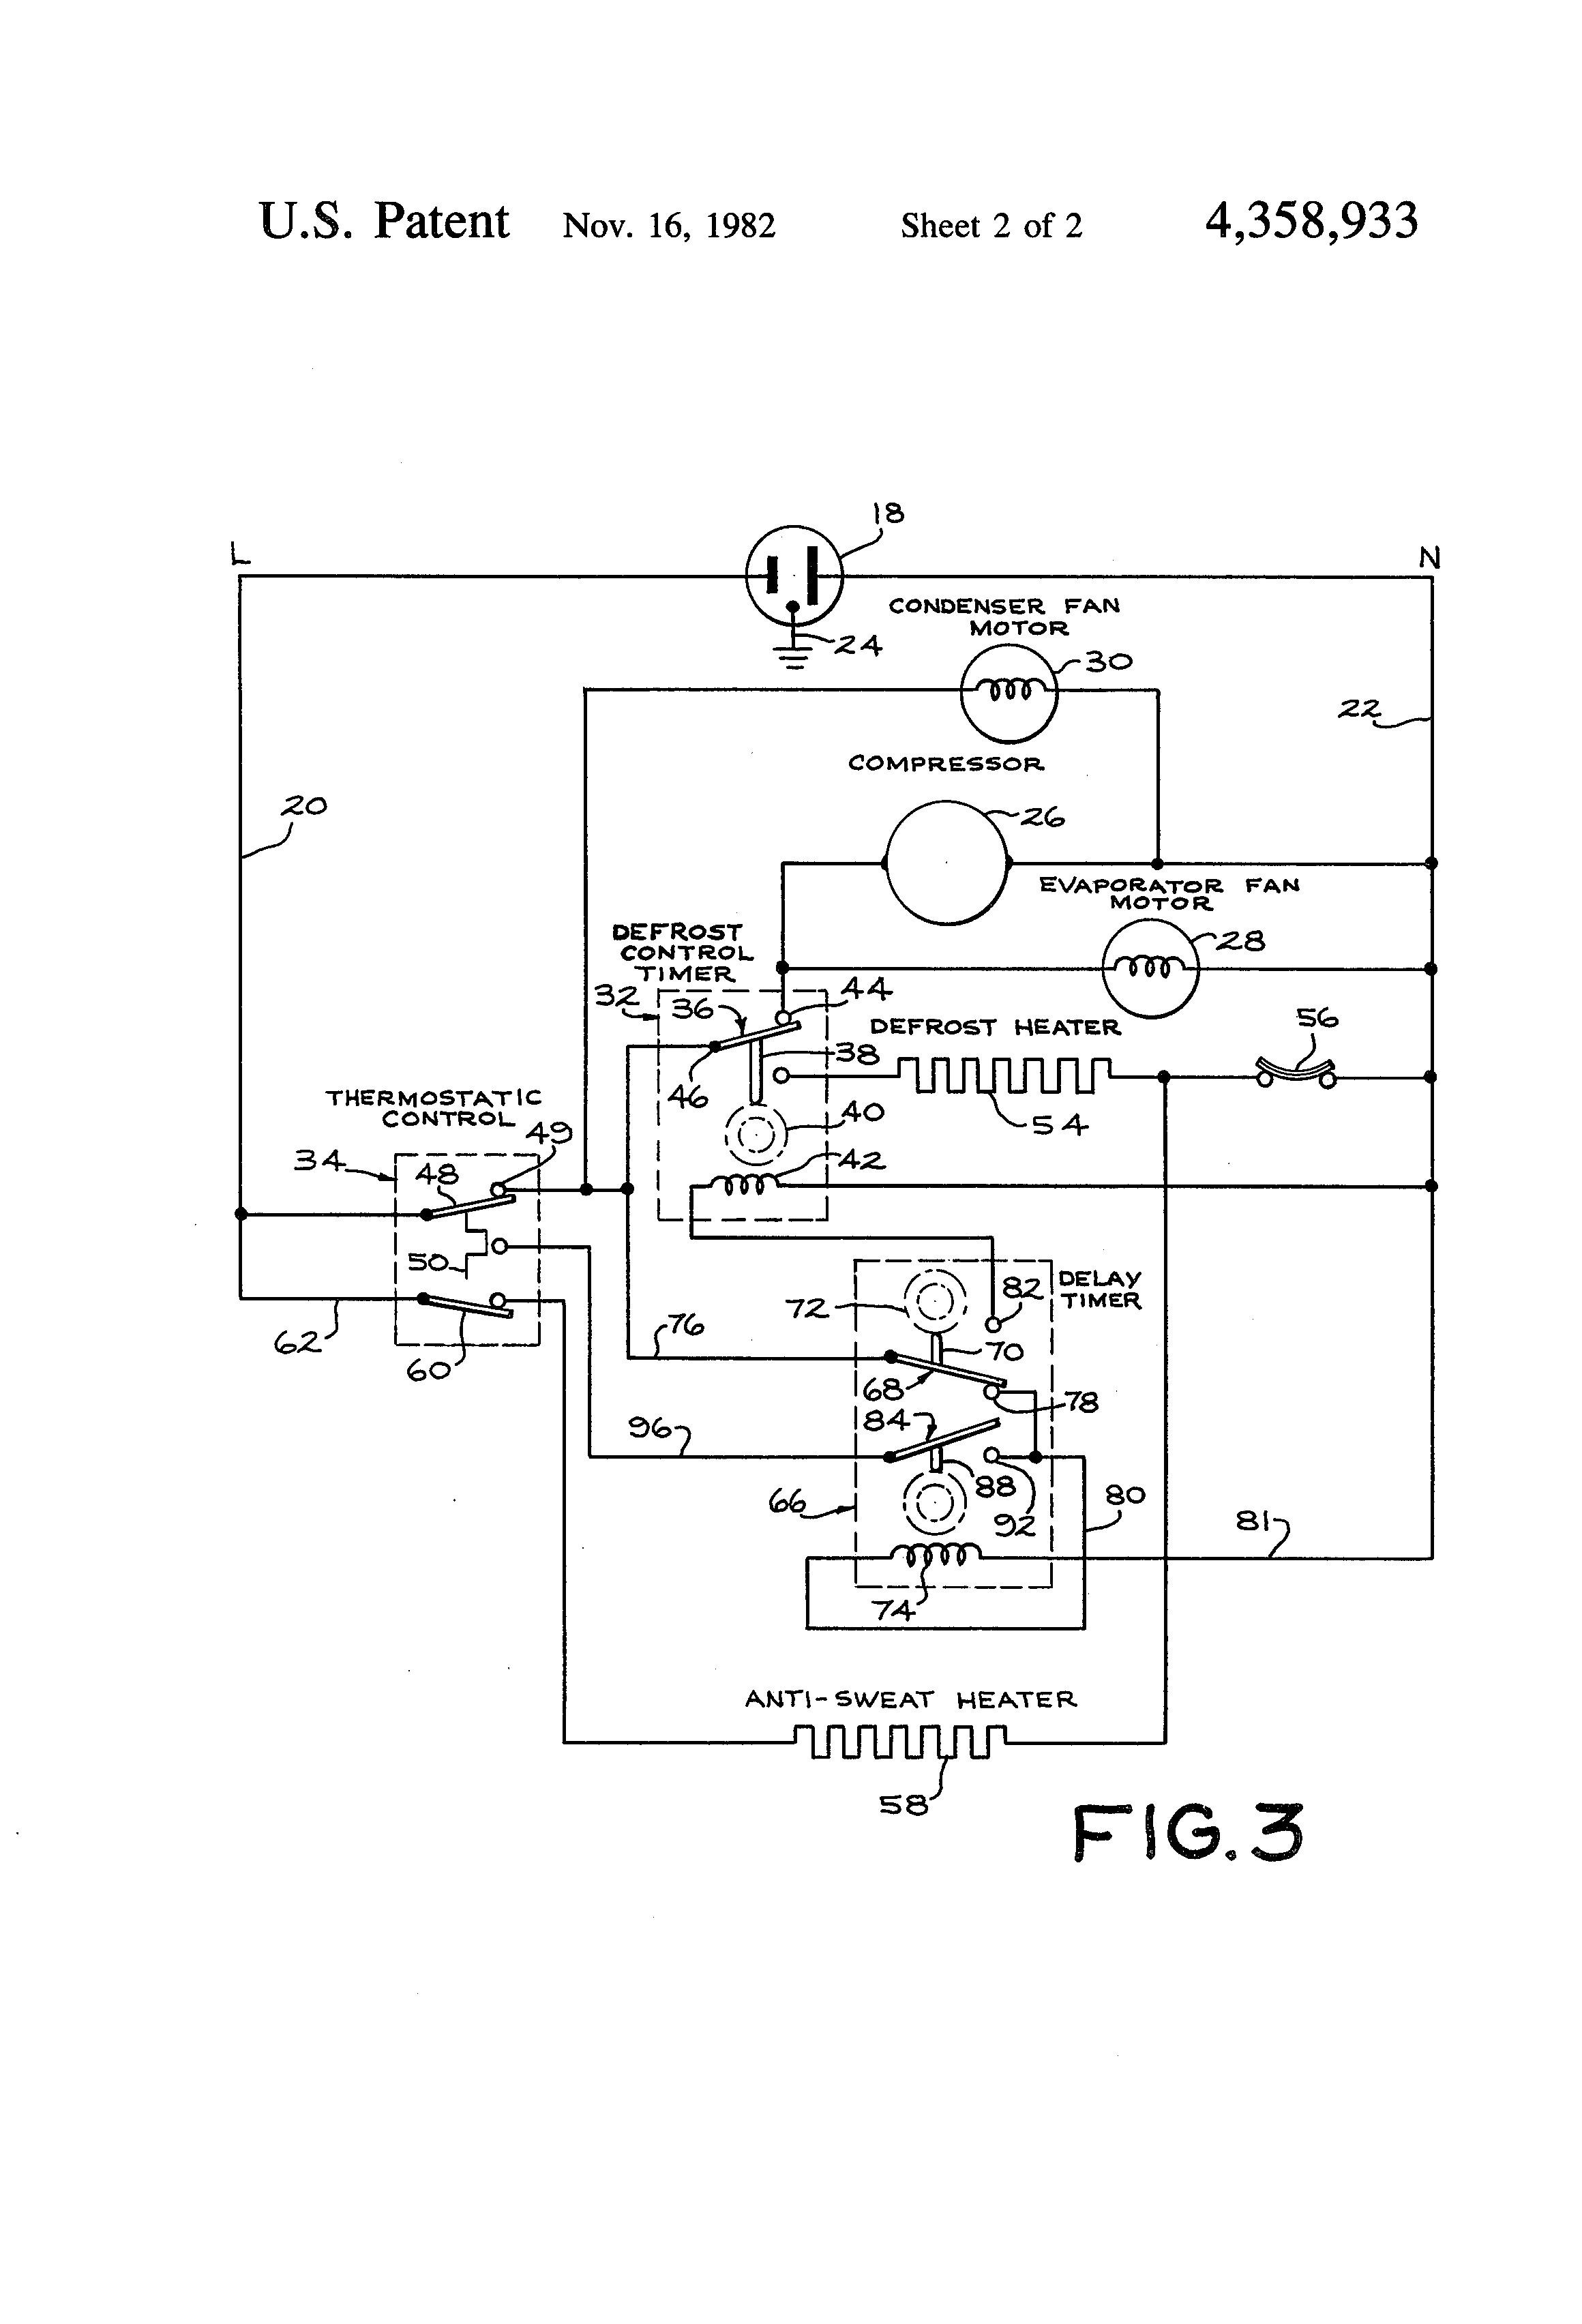 schematic wiring diagram of a refrigerator